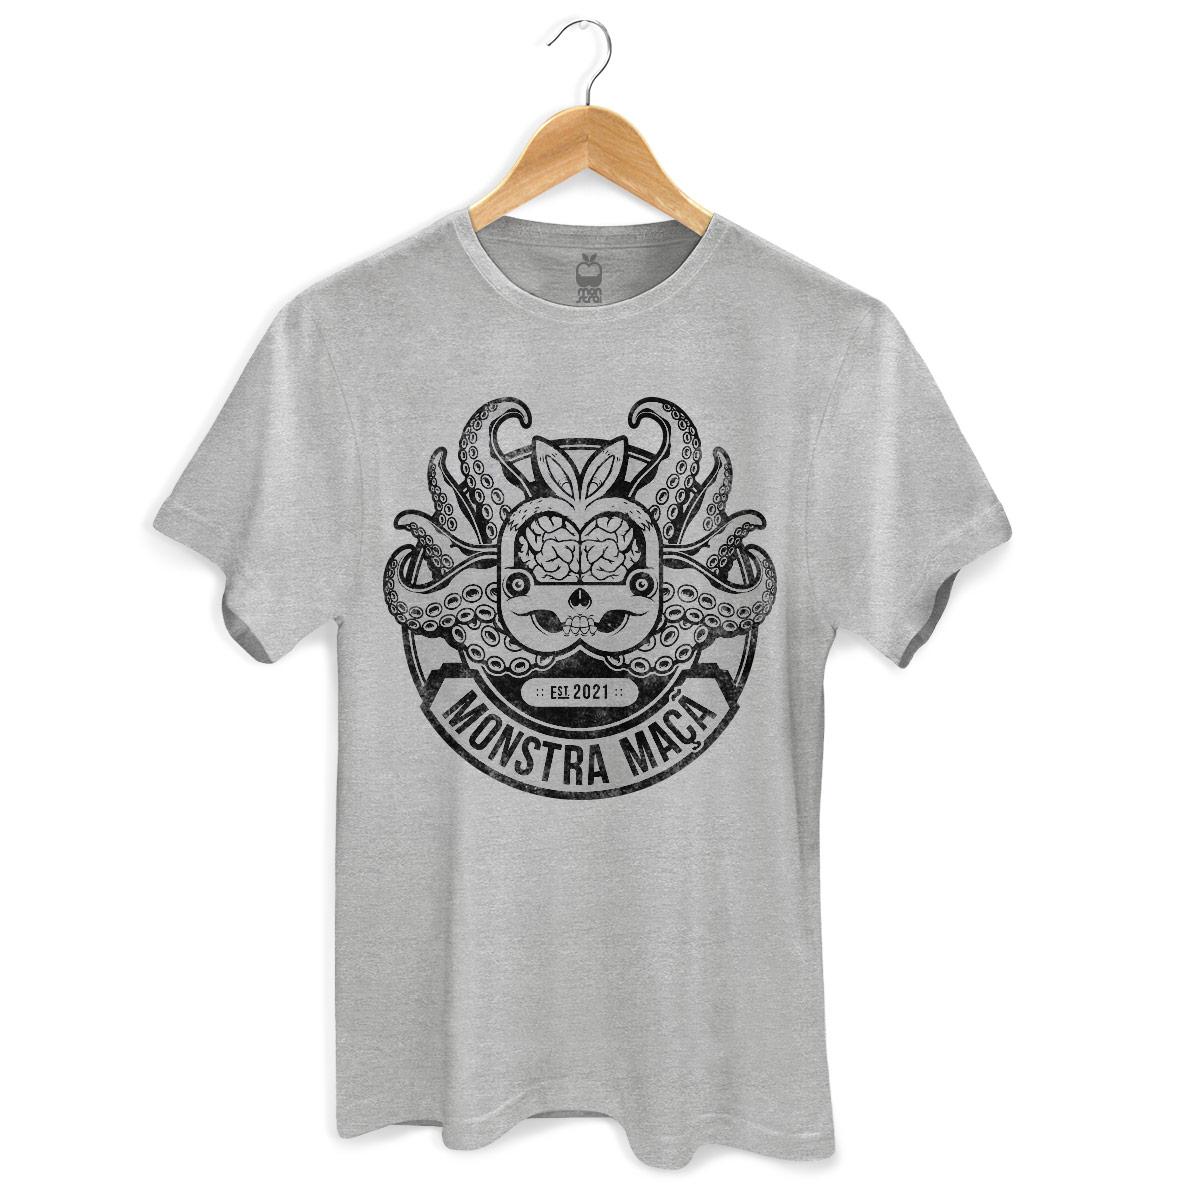 Camiseta Masculina Monstra Maçã Monster Octopus